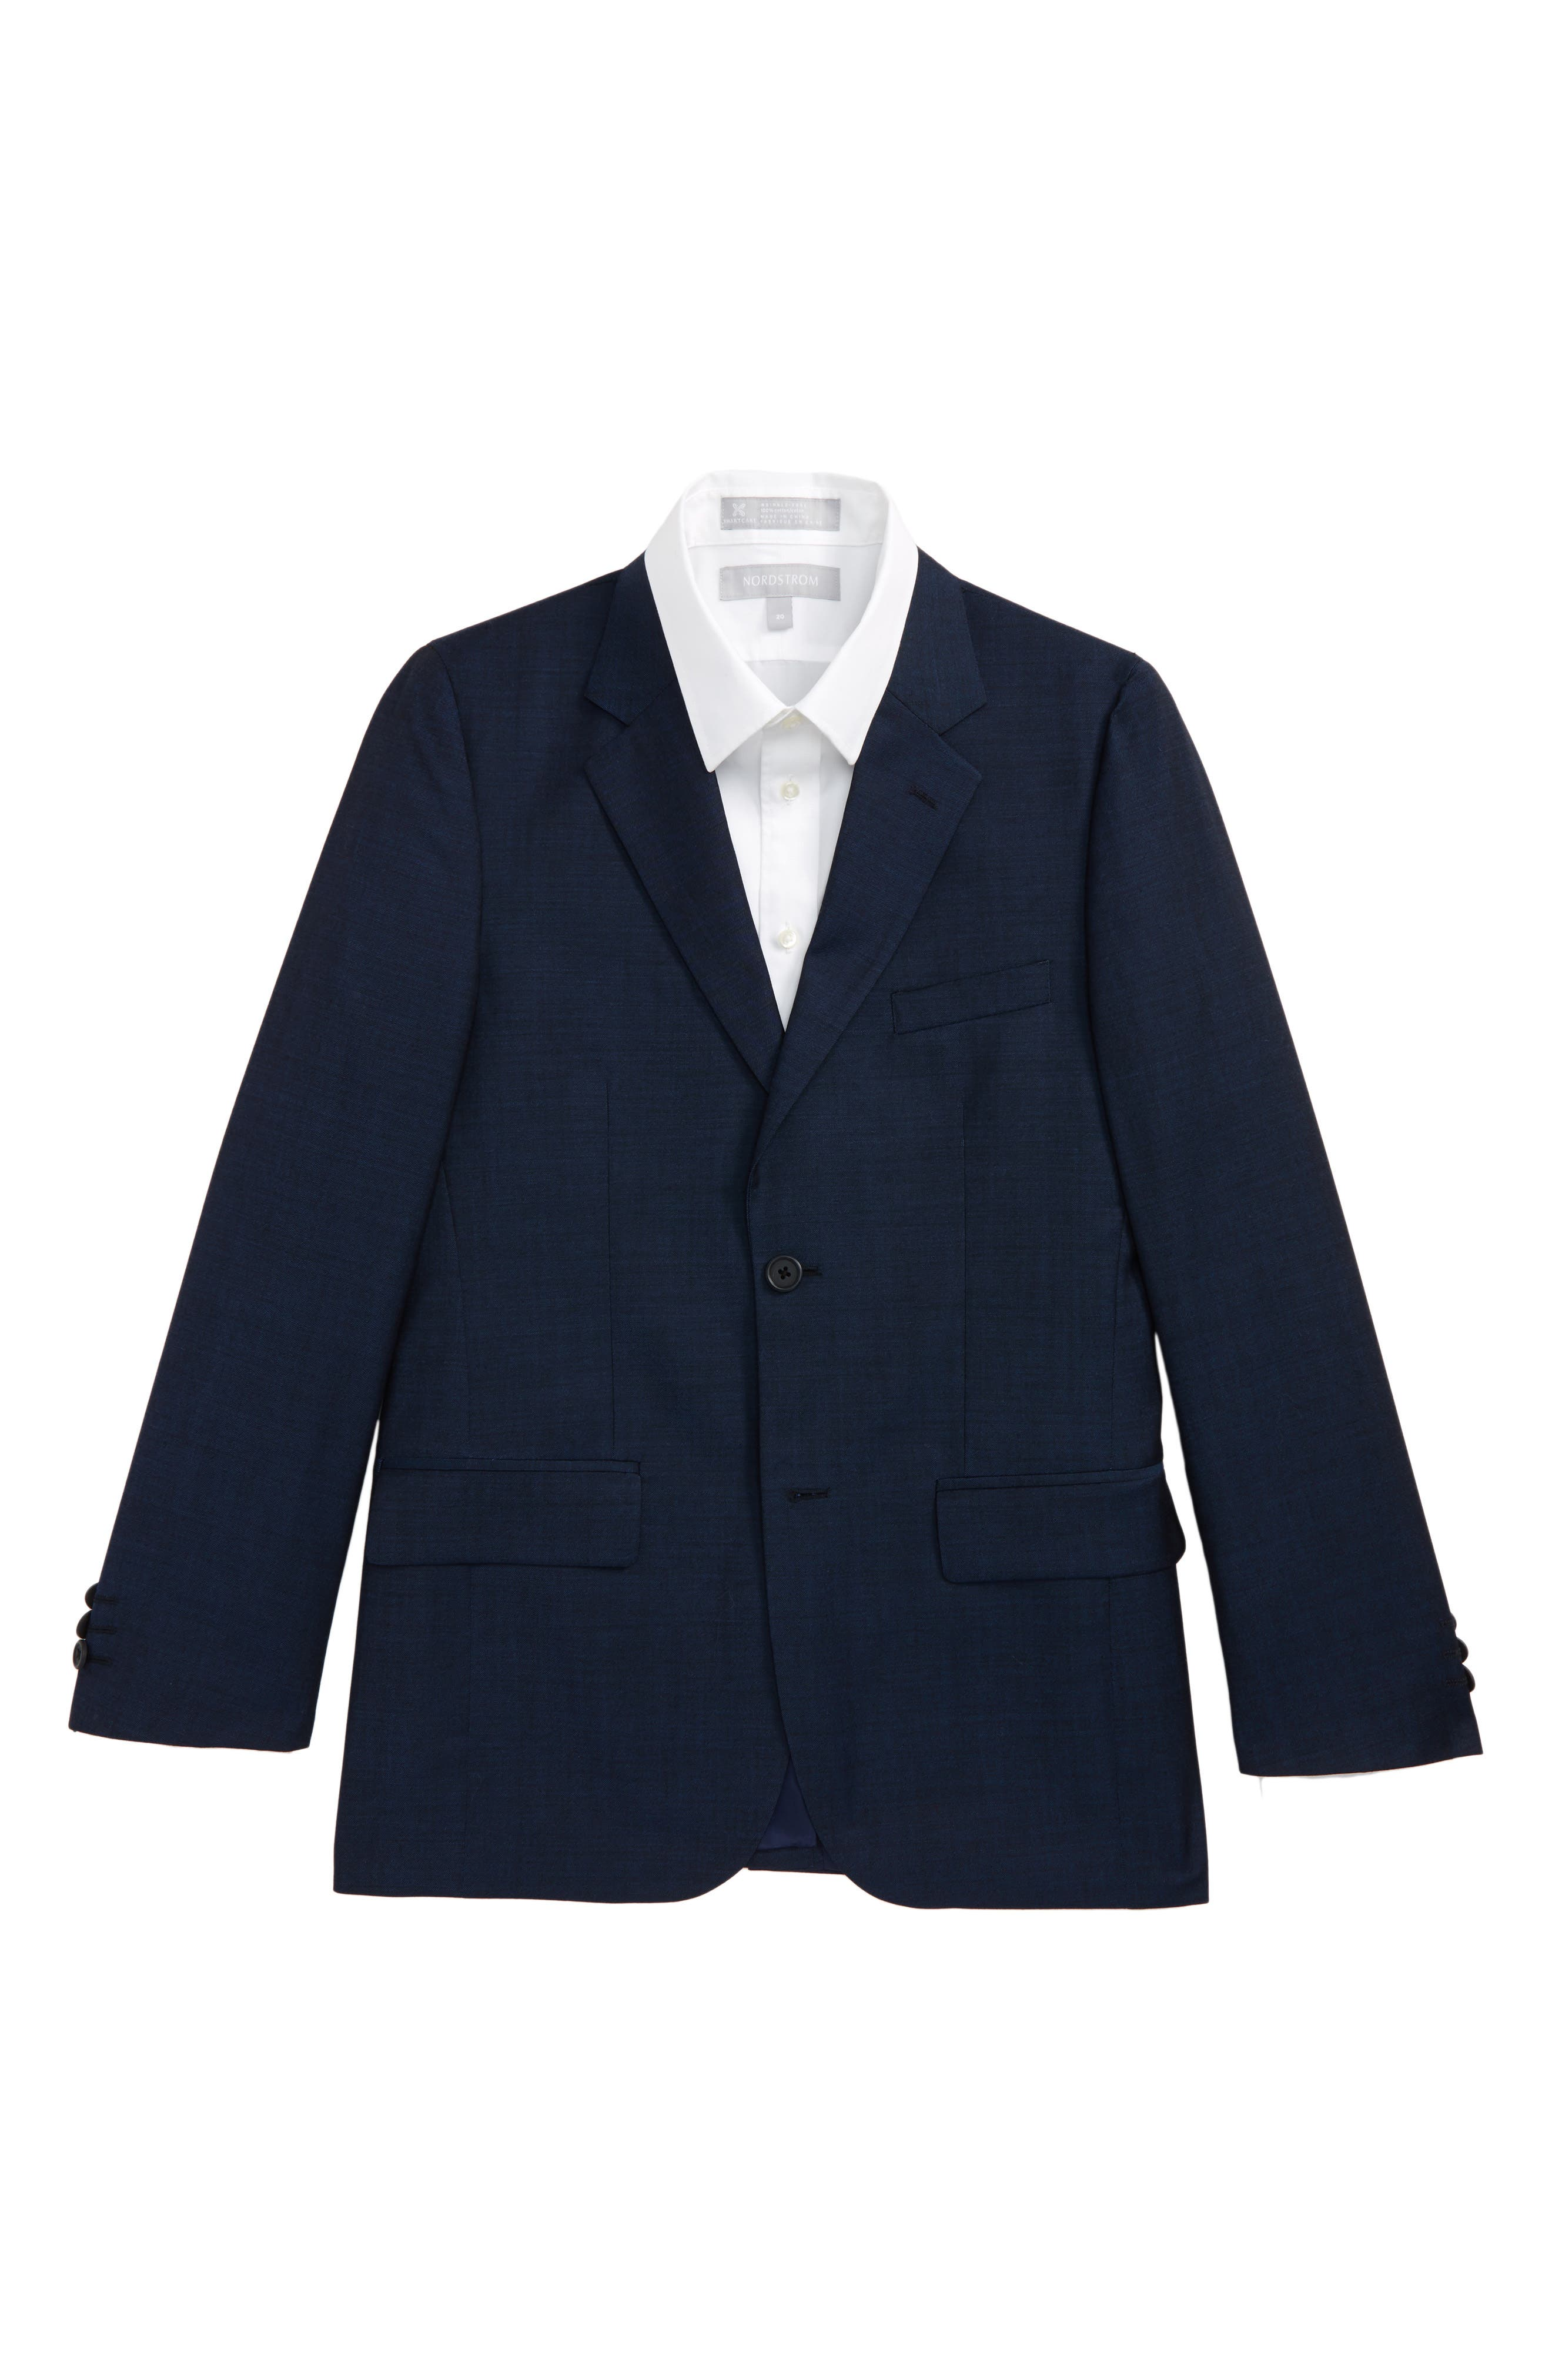 Alternate Image 1 Selected - JB Jr Wool Sport Coat (Big Boys)